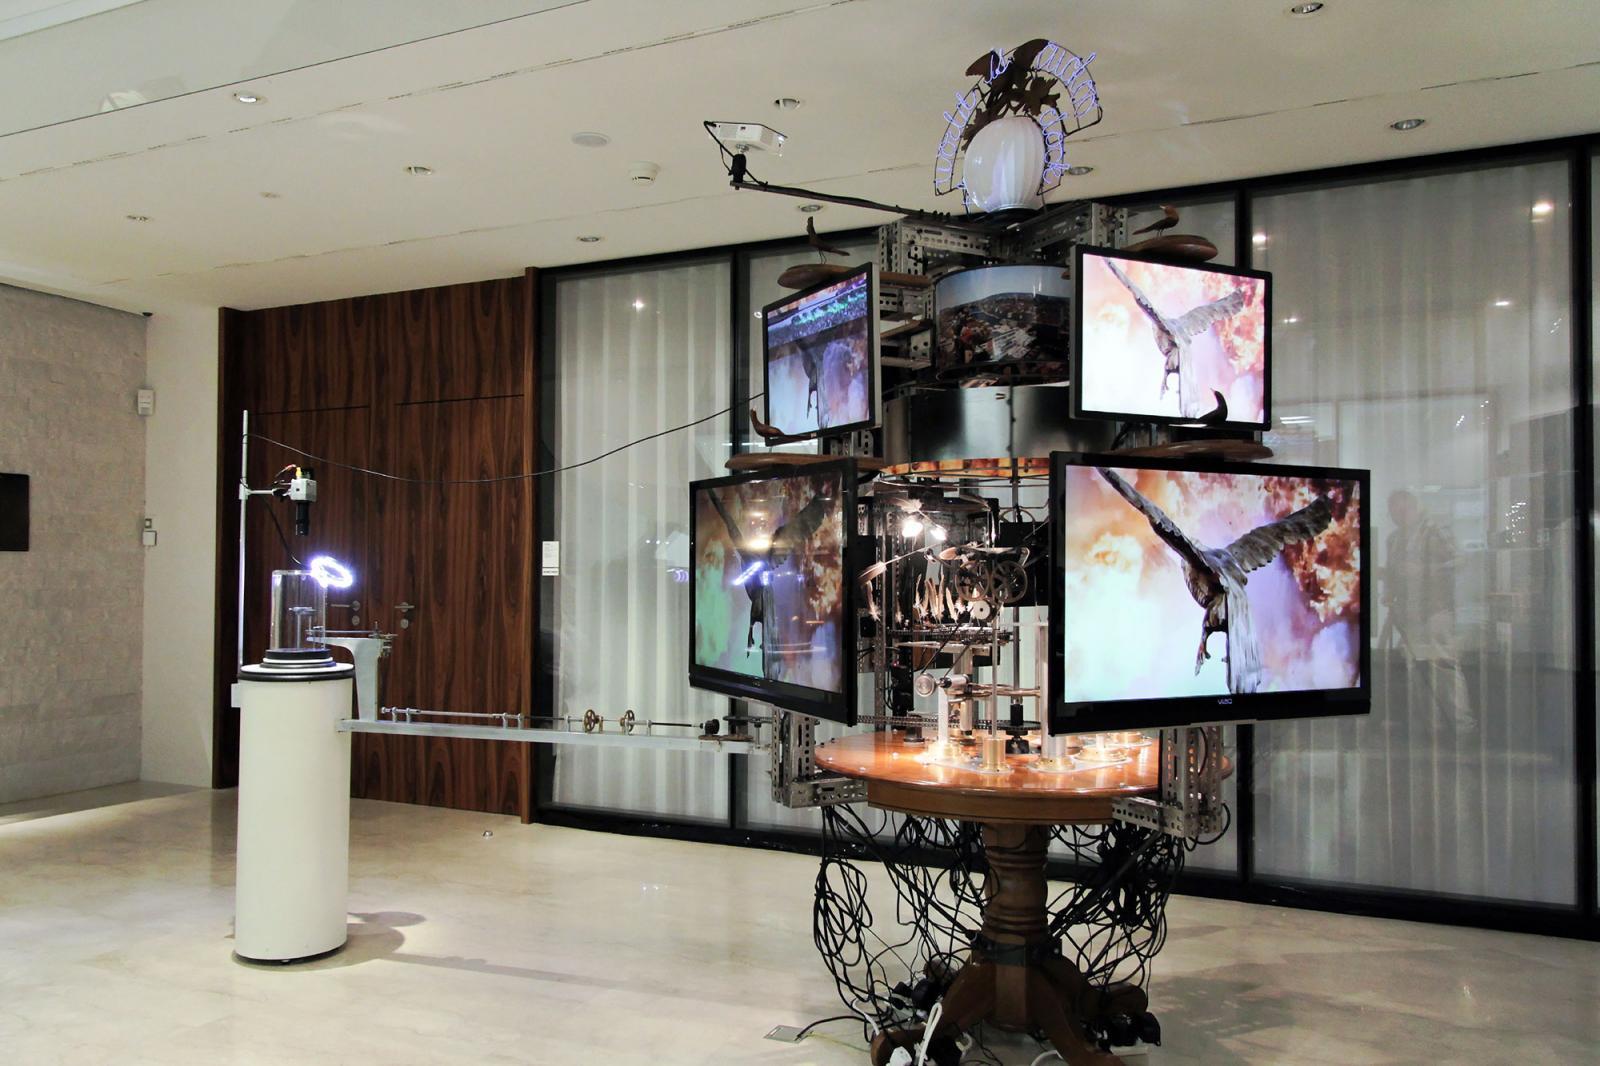 Jon Kessler Installation view /The World Is Cuckoo /atLes Ambassadeurs watch shop Photo: Manifesta 11 / Wolfgang Träger